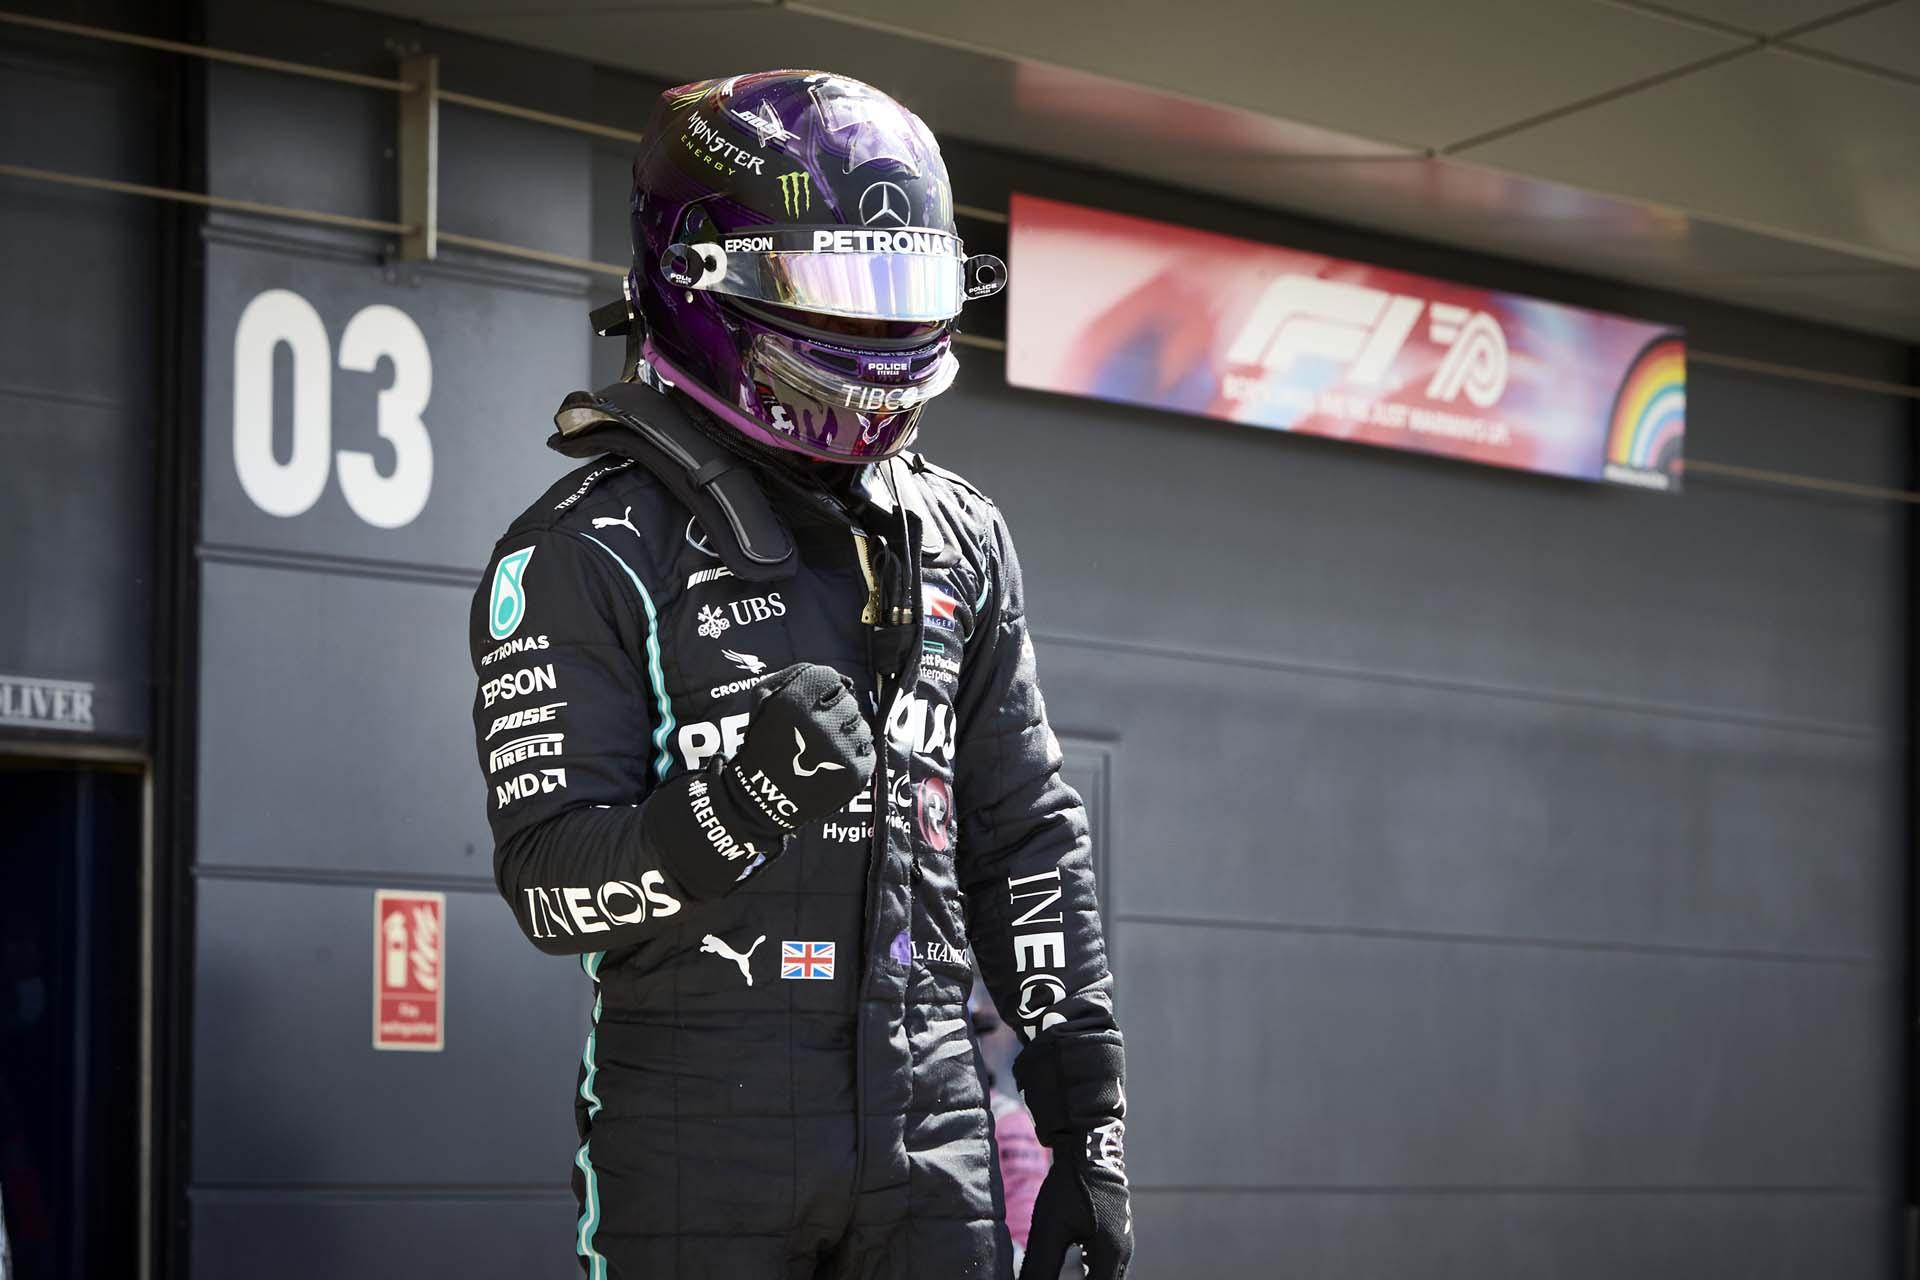 2020 British Grand Prix, Saturday - Steve Etherington